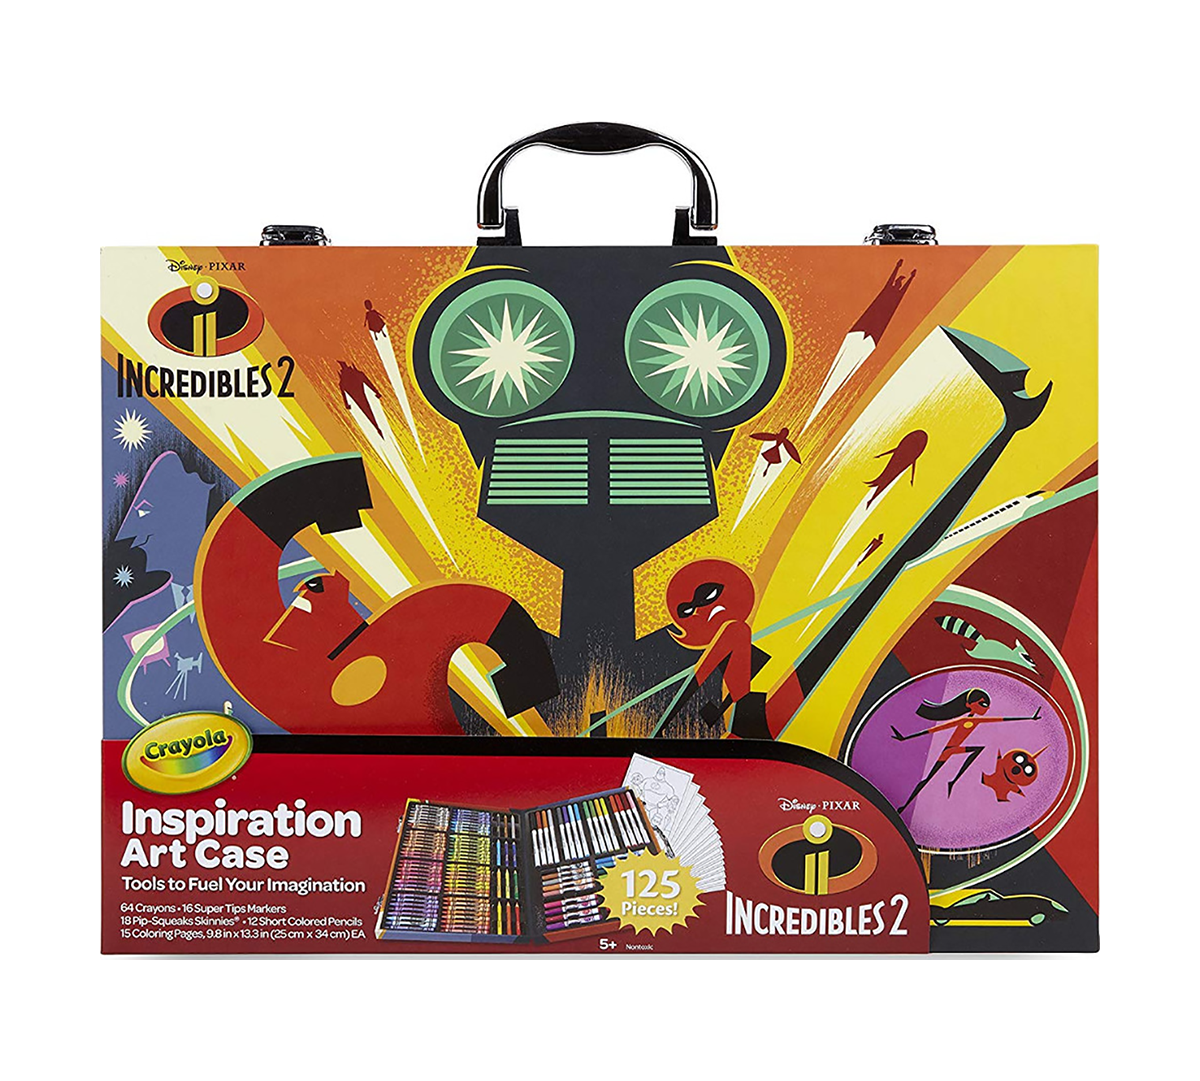 Crayola Incredibles 2 Inspiration Art Case Over 90